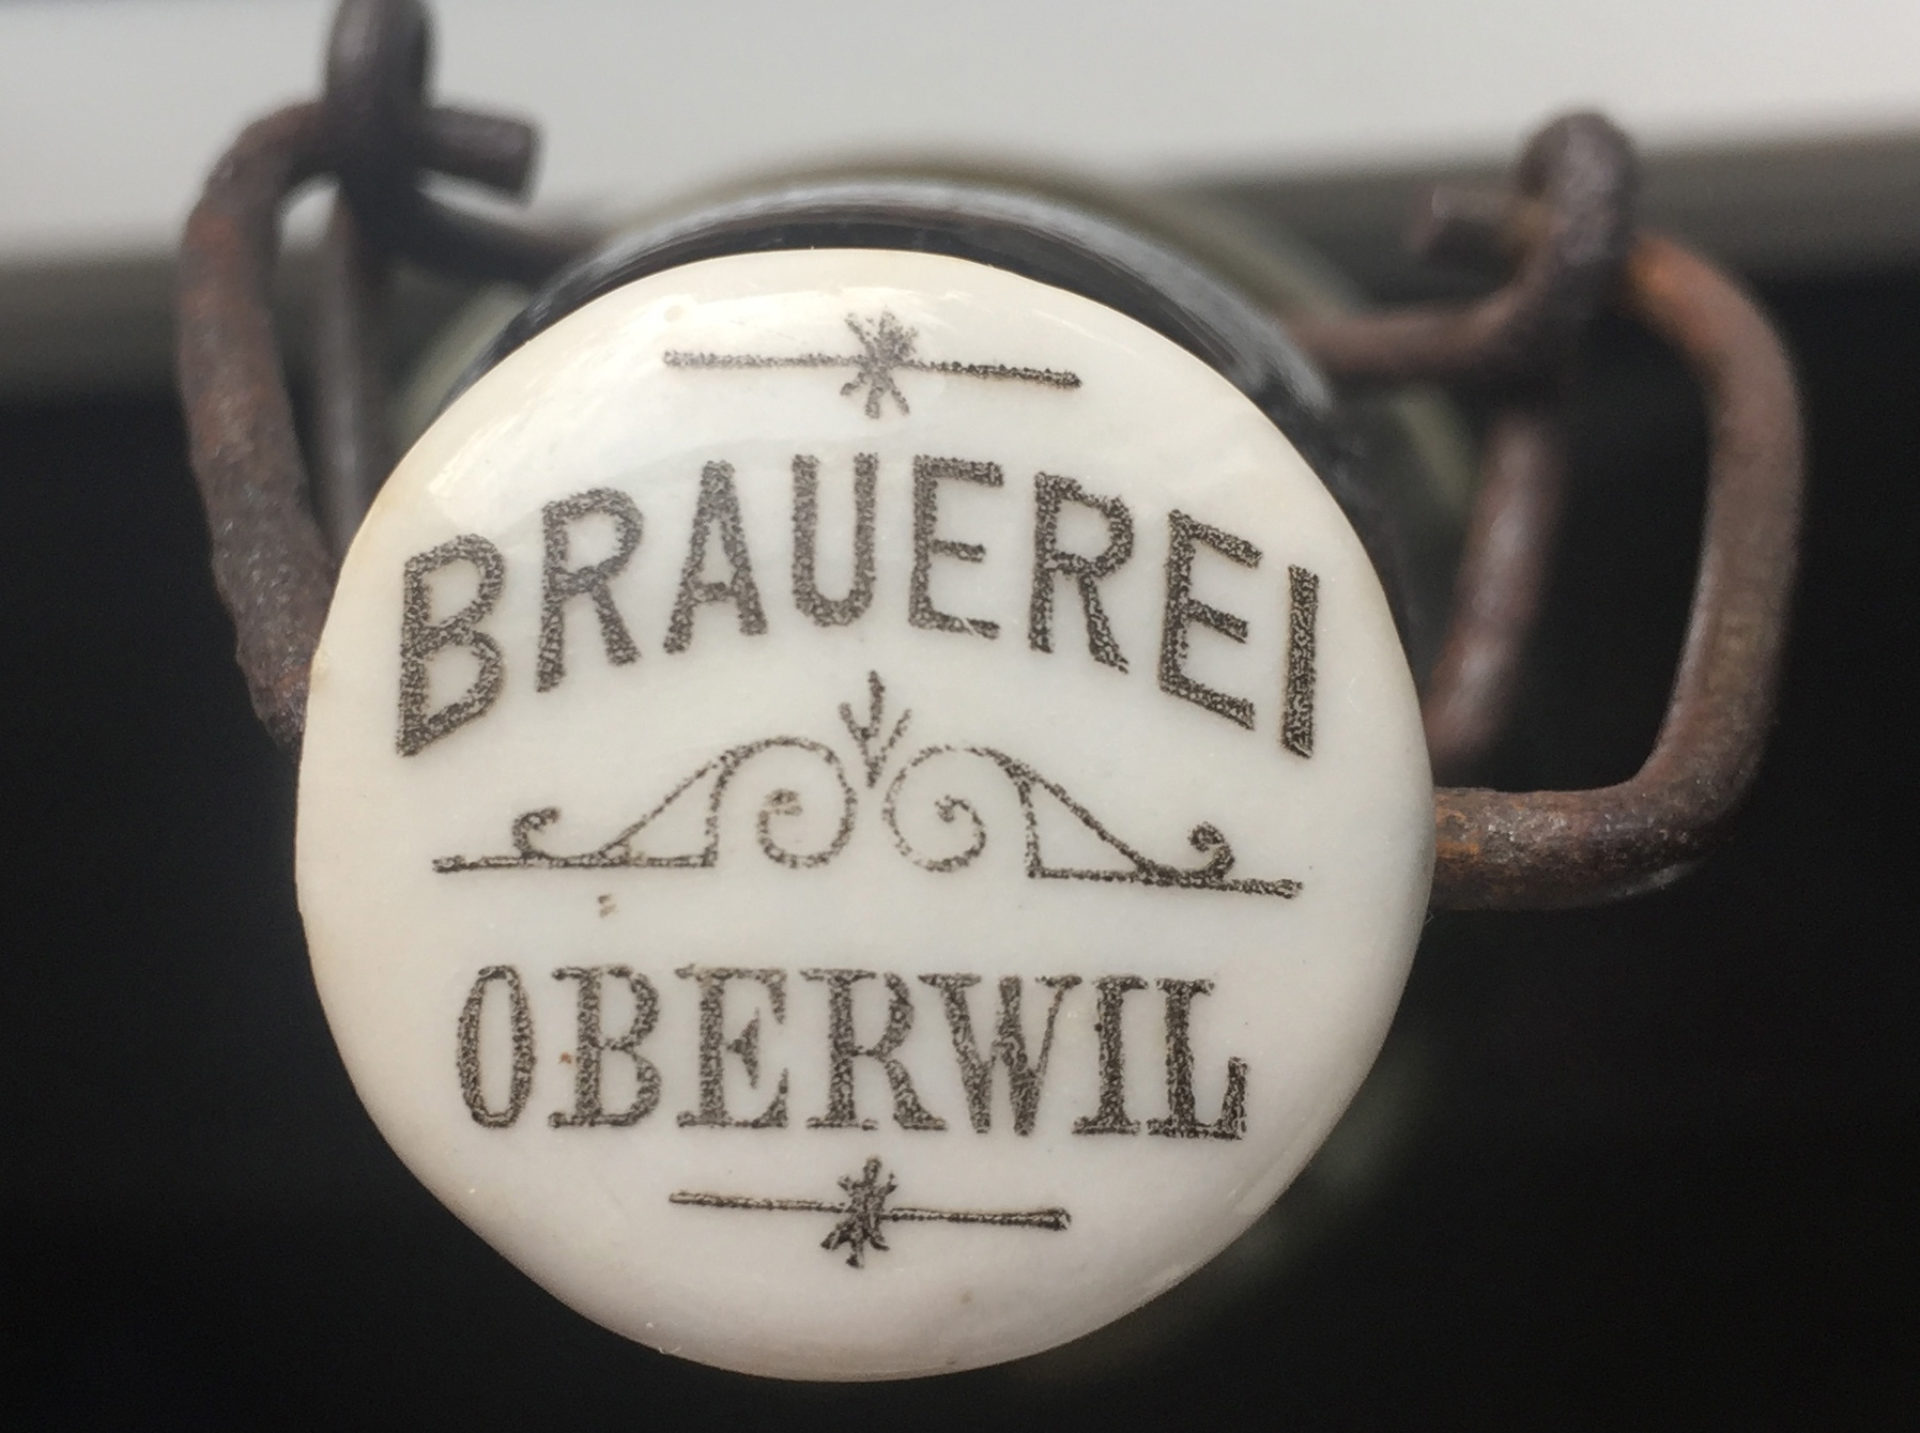 Brauerei Oberwil Waldschlössli